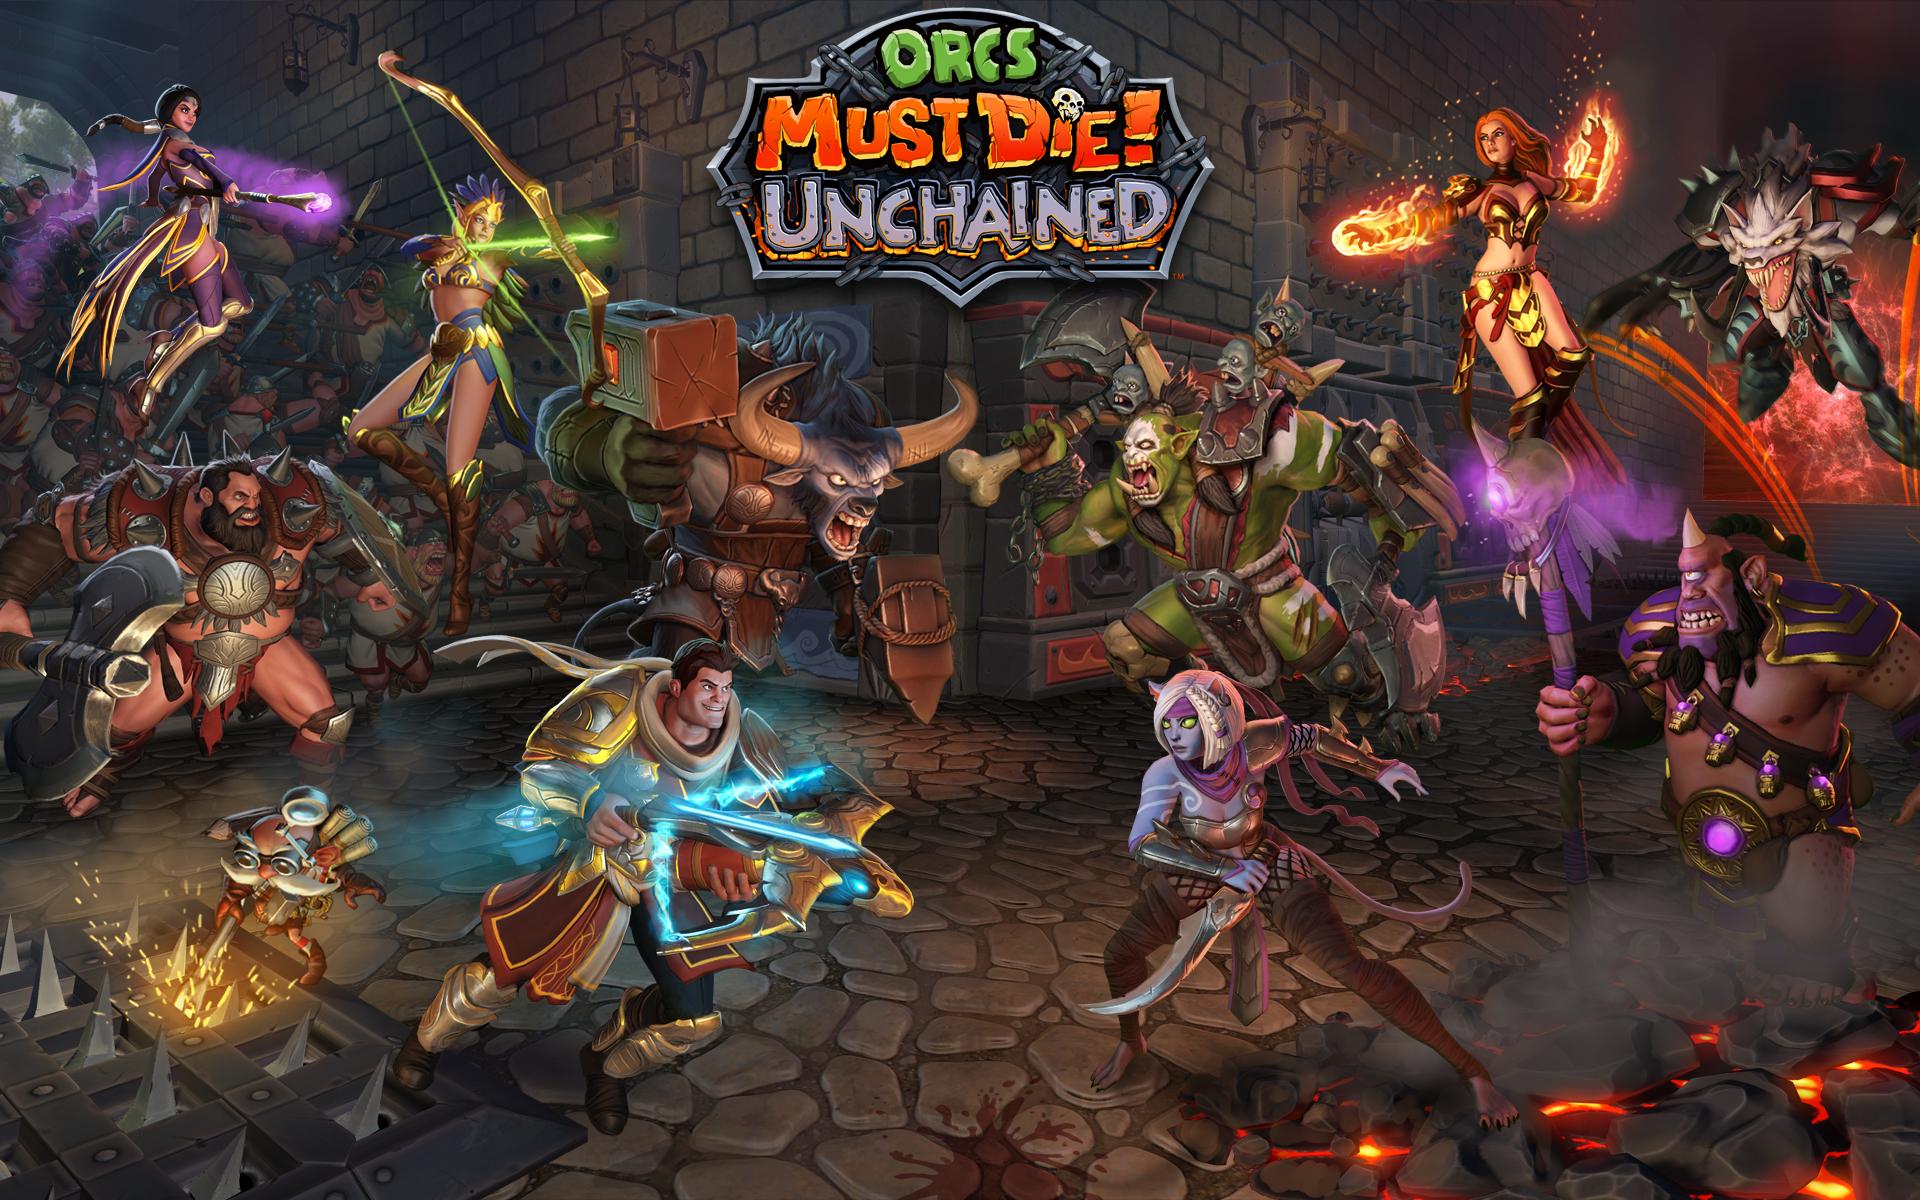 Orcs must die! Unchained adaugă un nou erou